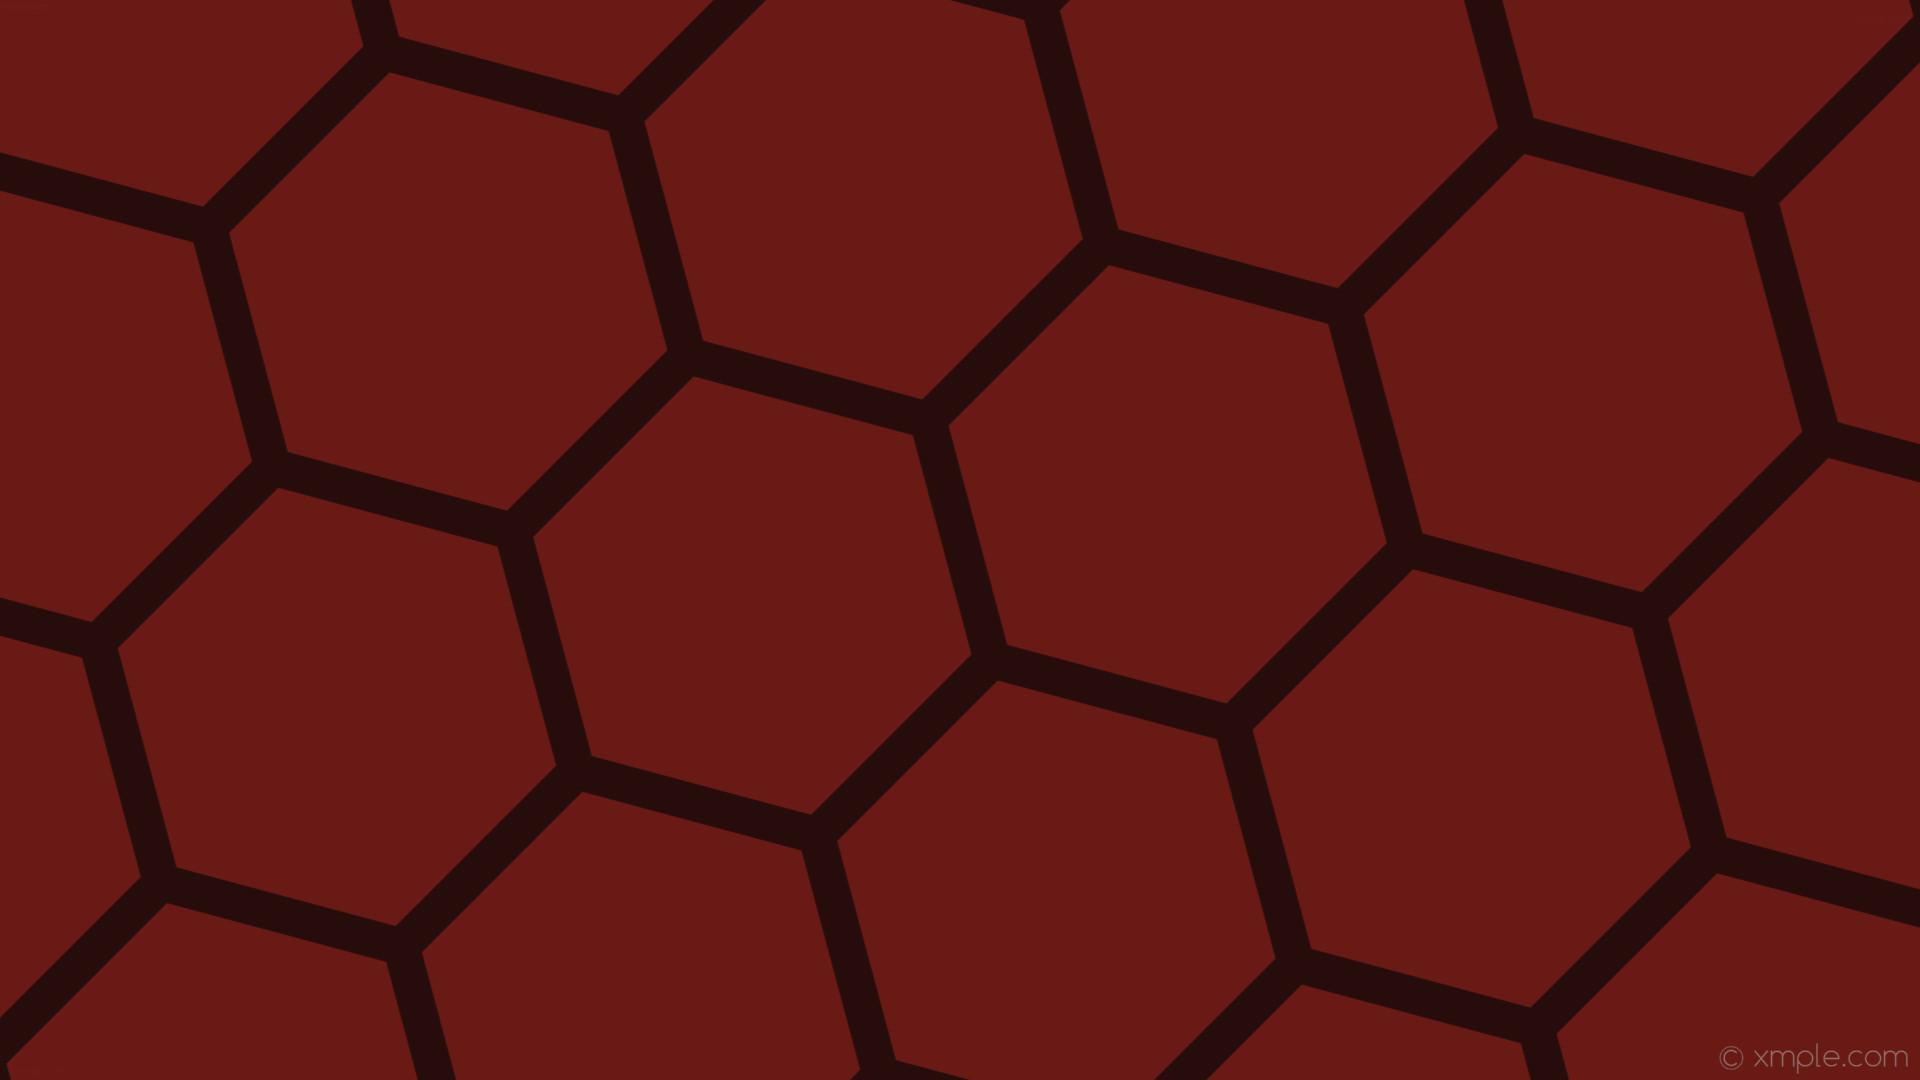 wallpaper hexagon red honeycomb beehive dark red #691a14 #260d0b diagonal  15° 37px 430px